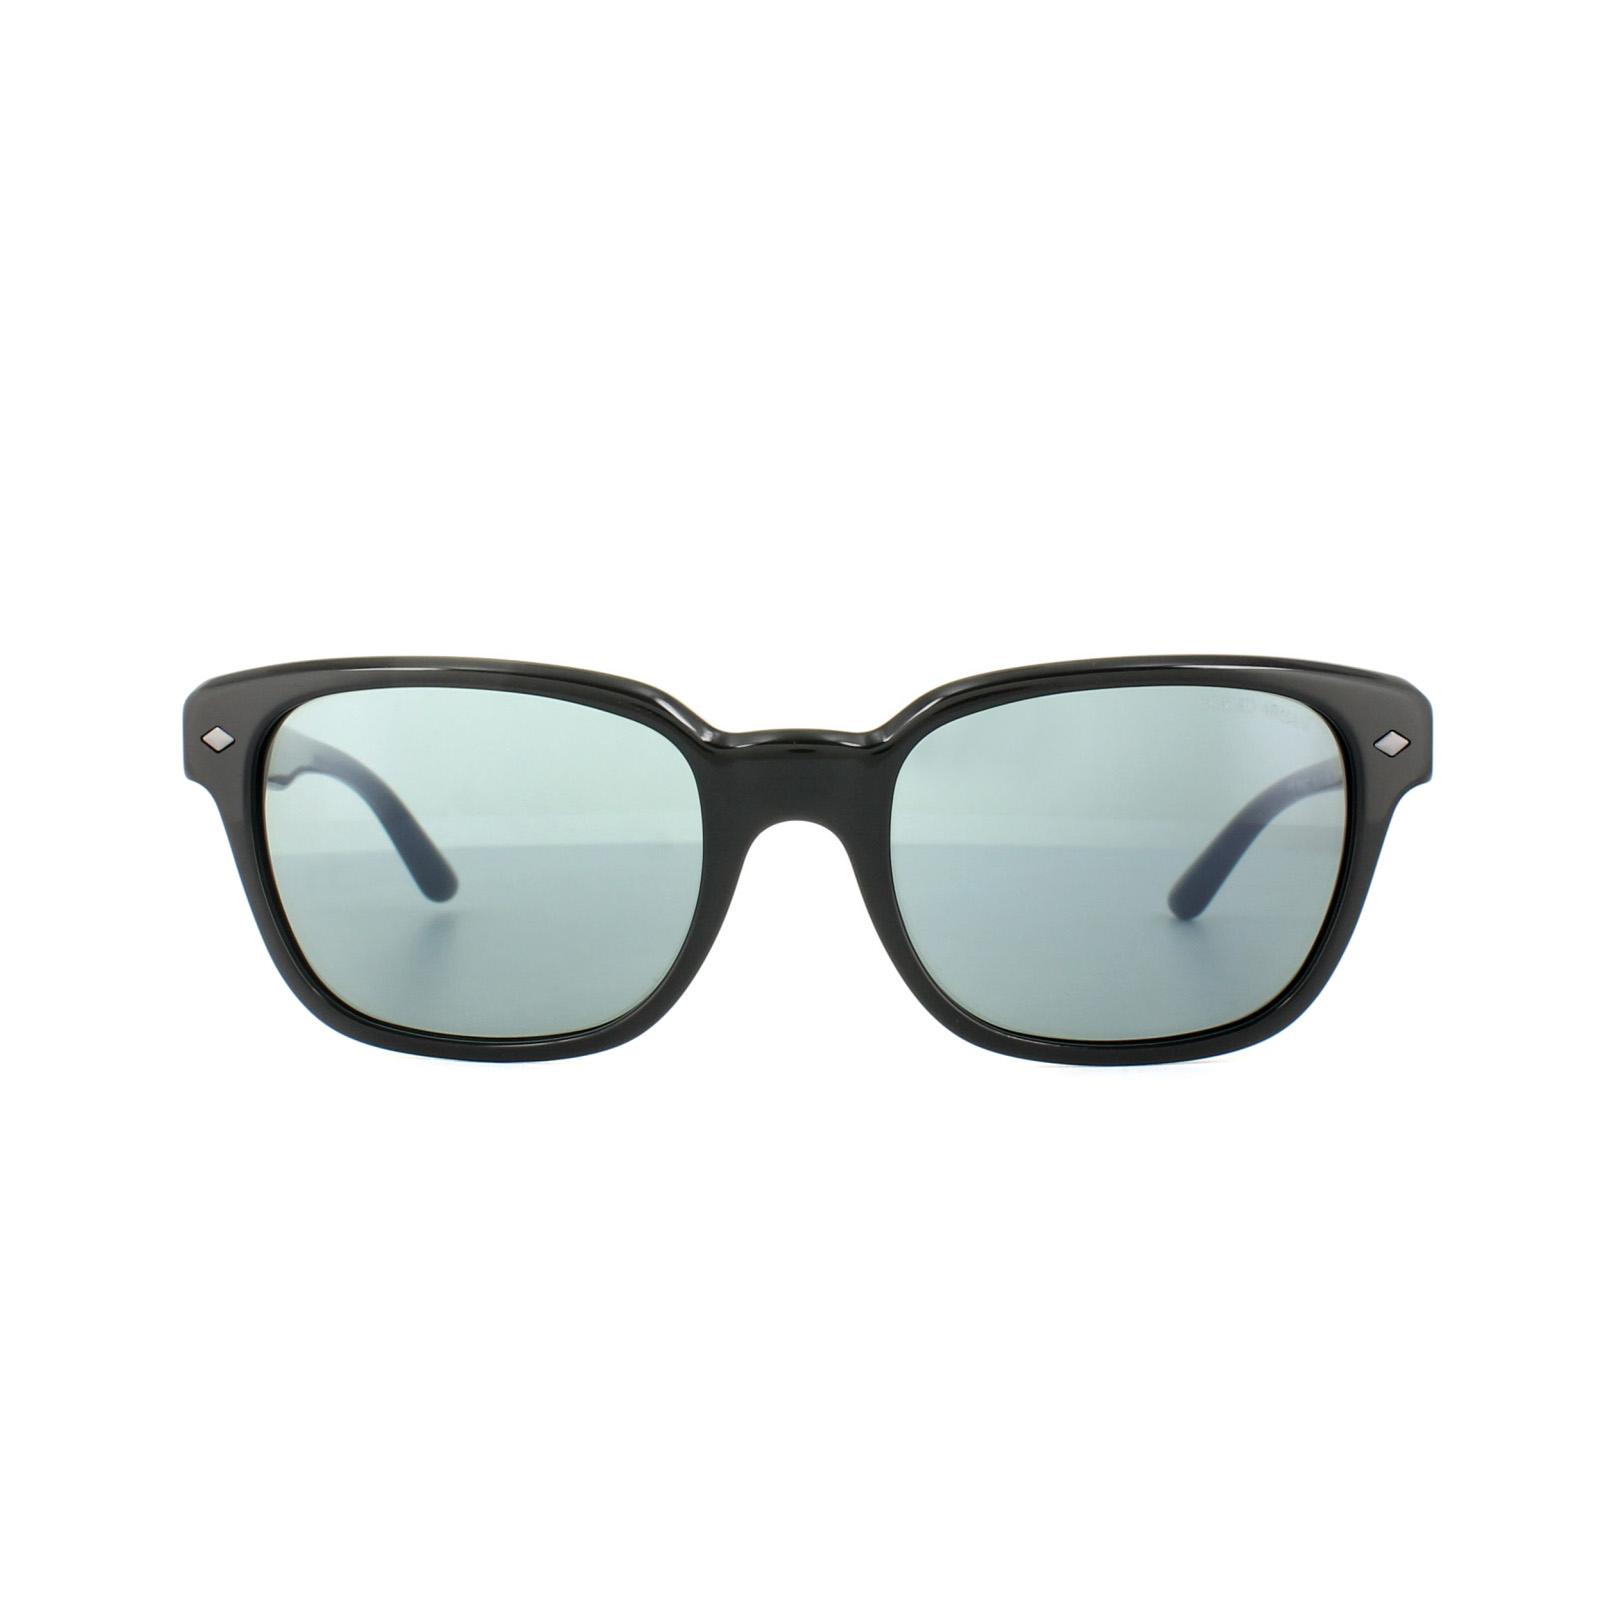 184390d0c2ed Sentinel Thumbnail 1. Sentinel Giorgio Armani Sunglasses AR8067 5017R5  Black Grey. Sentinel Thumbnail 2